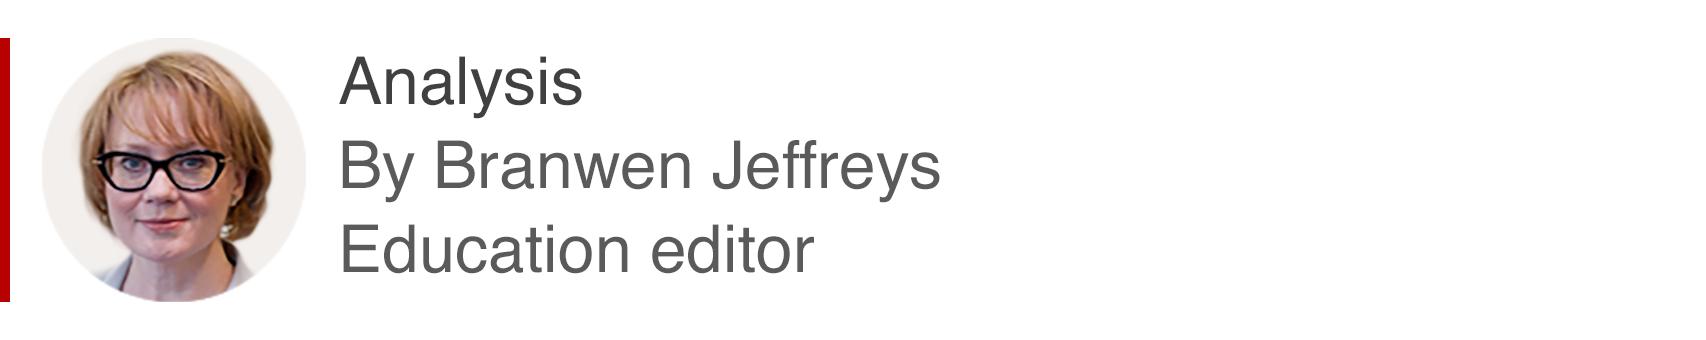 Analysis box by Branwen Jeffreys, education editor